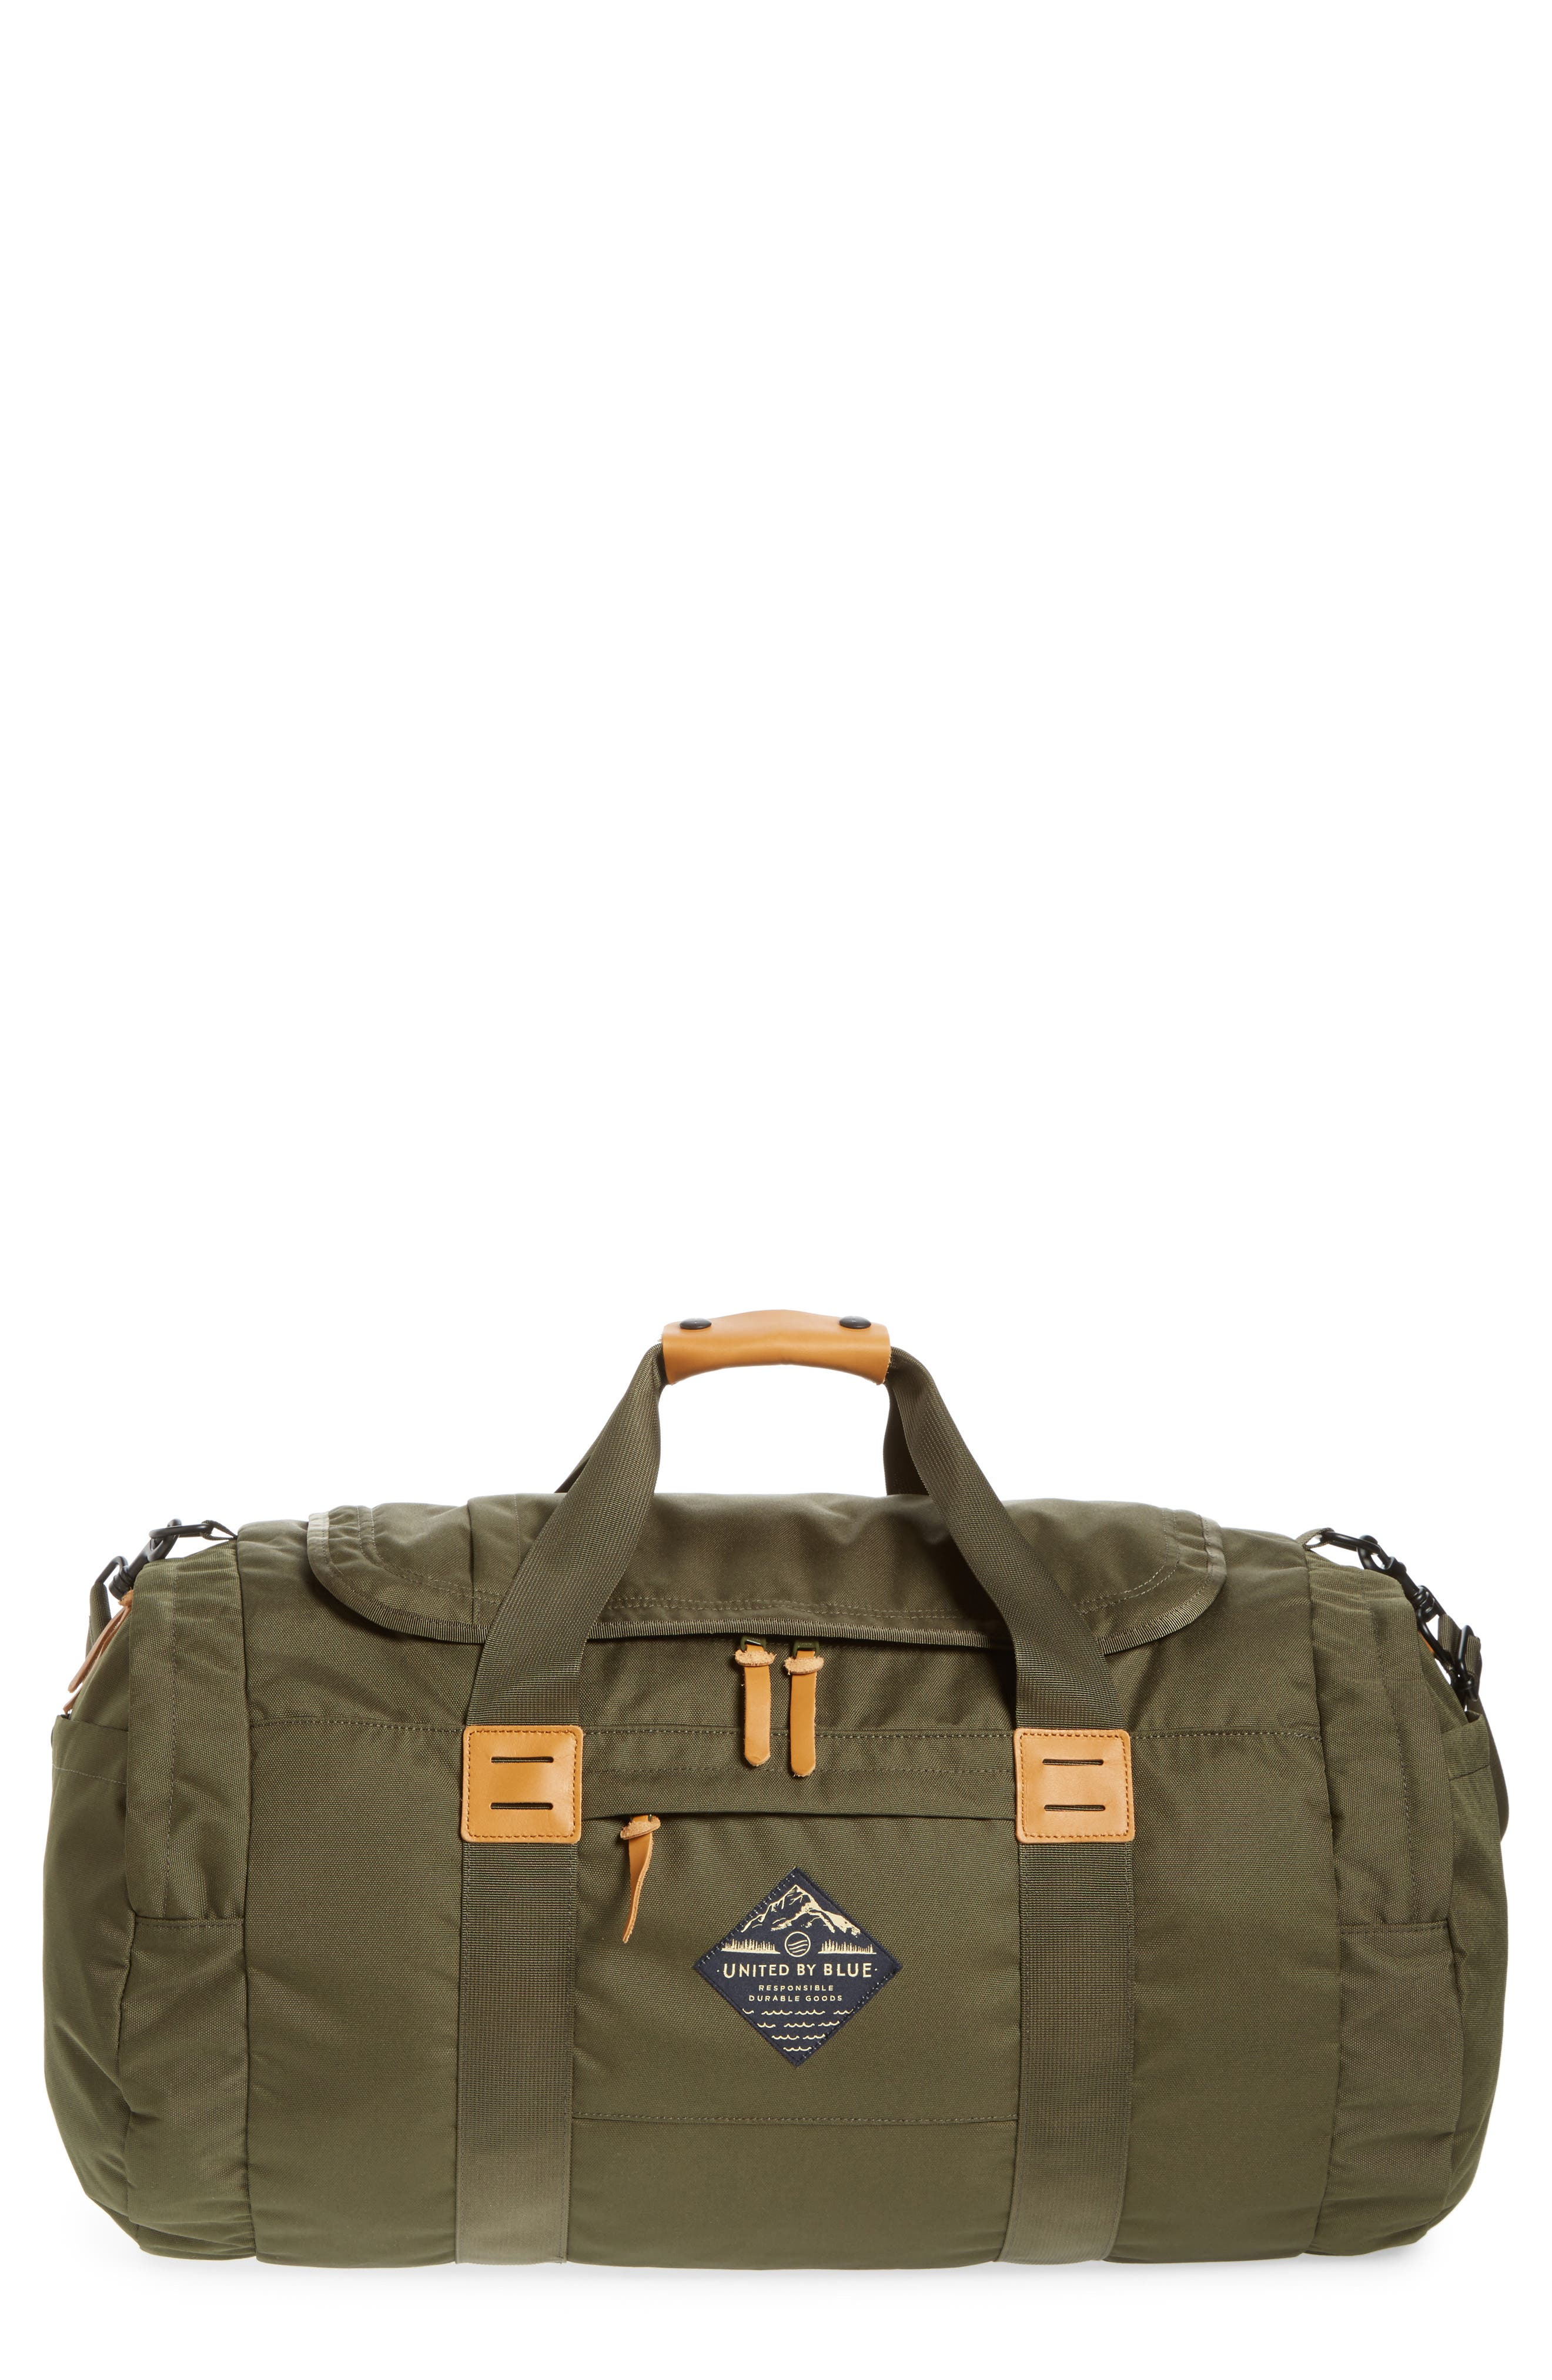 Arc Duffel Bag,                         Main,                         color, Olive